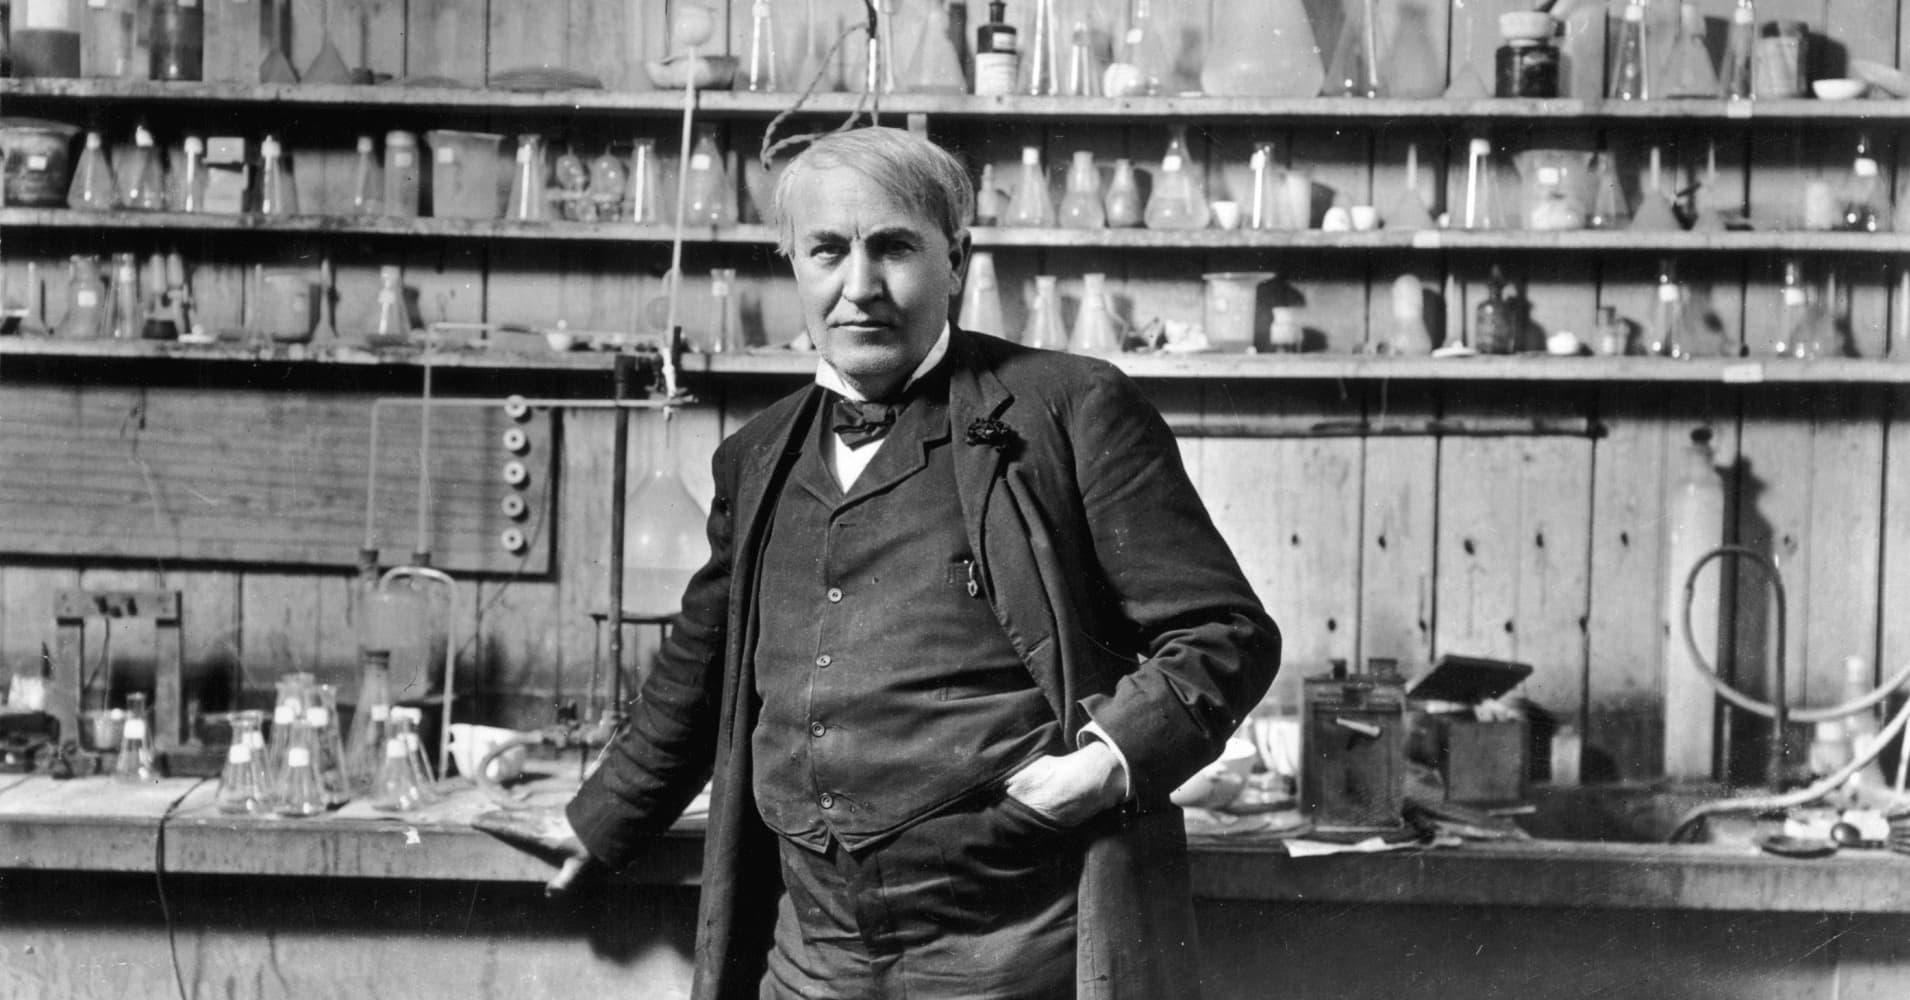 American inventor Thomas Alva Edison (1847-1931) standing in his laboratory, Menlo Park, New Jersey.